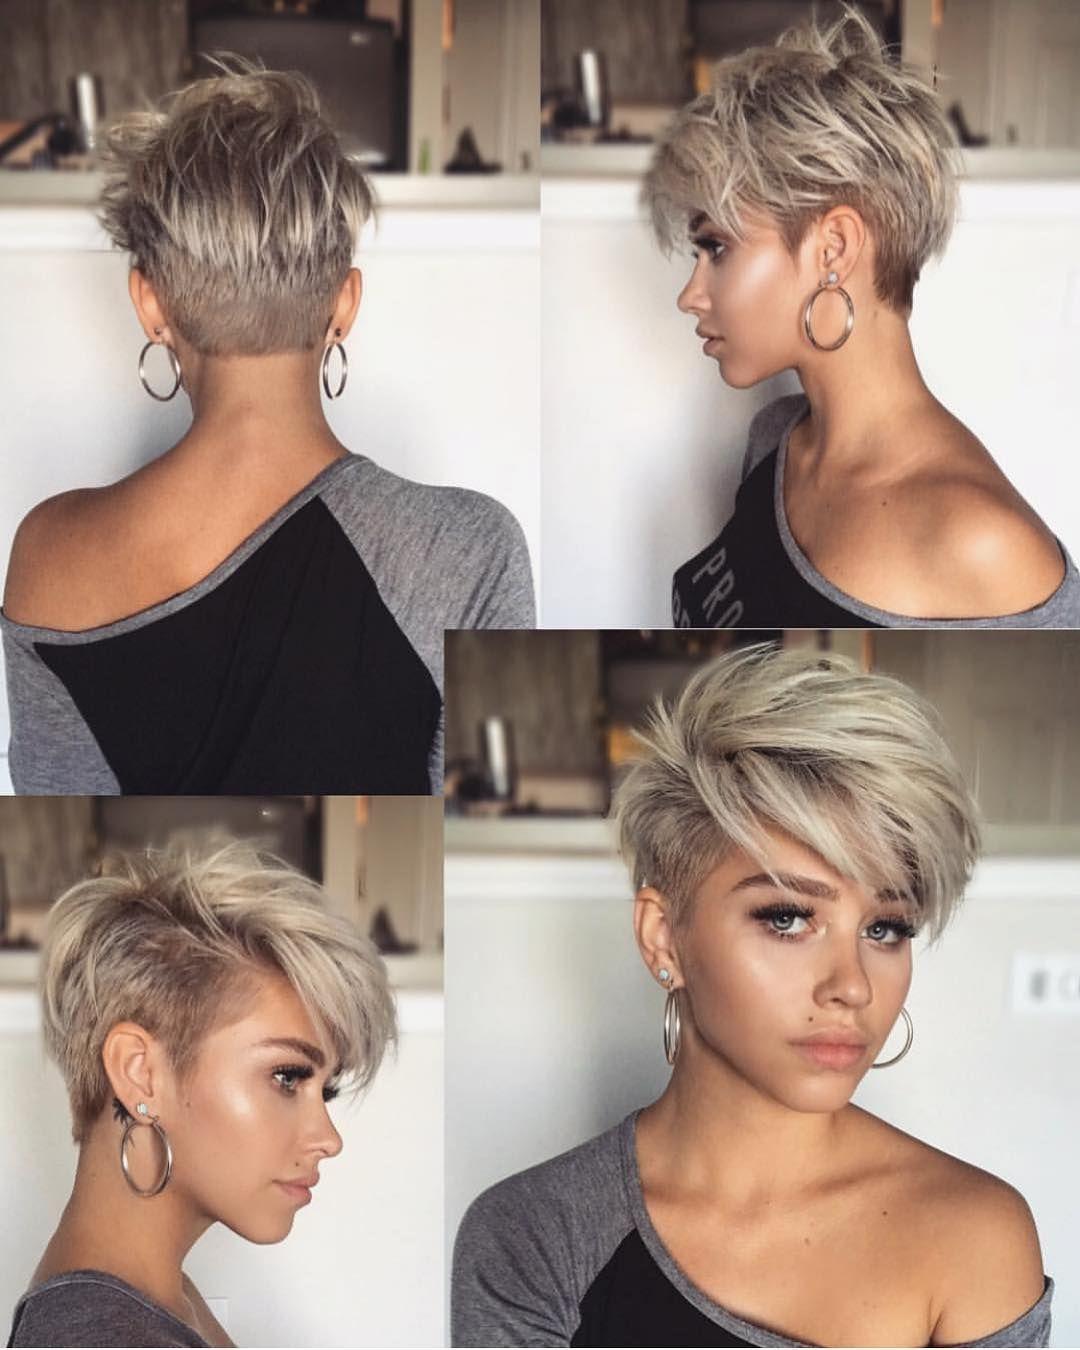 pin by dj on hotcut in 2018 | pinterest | hair, short hair styles